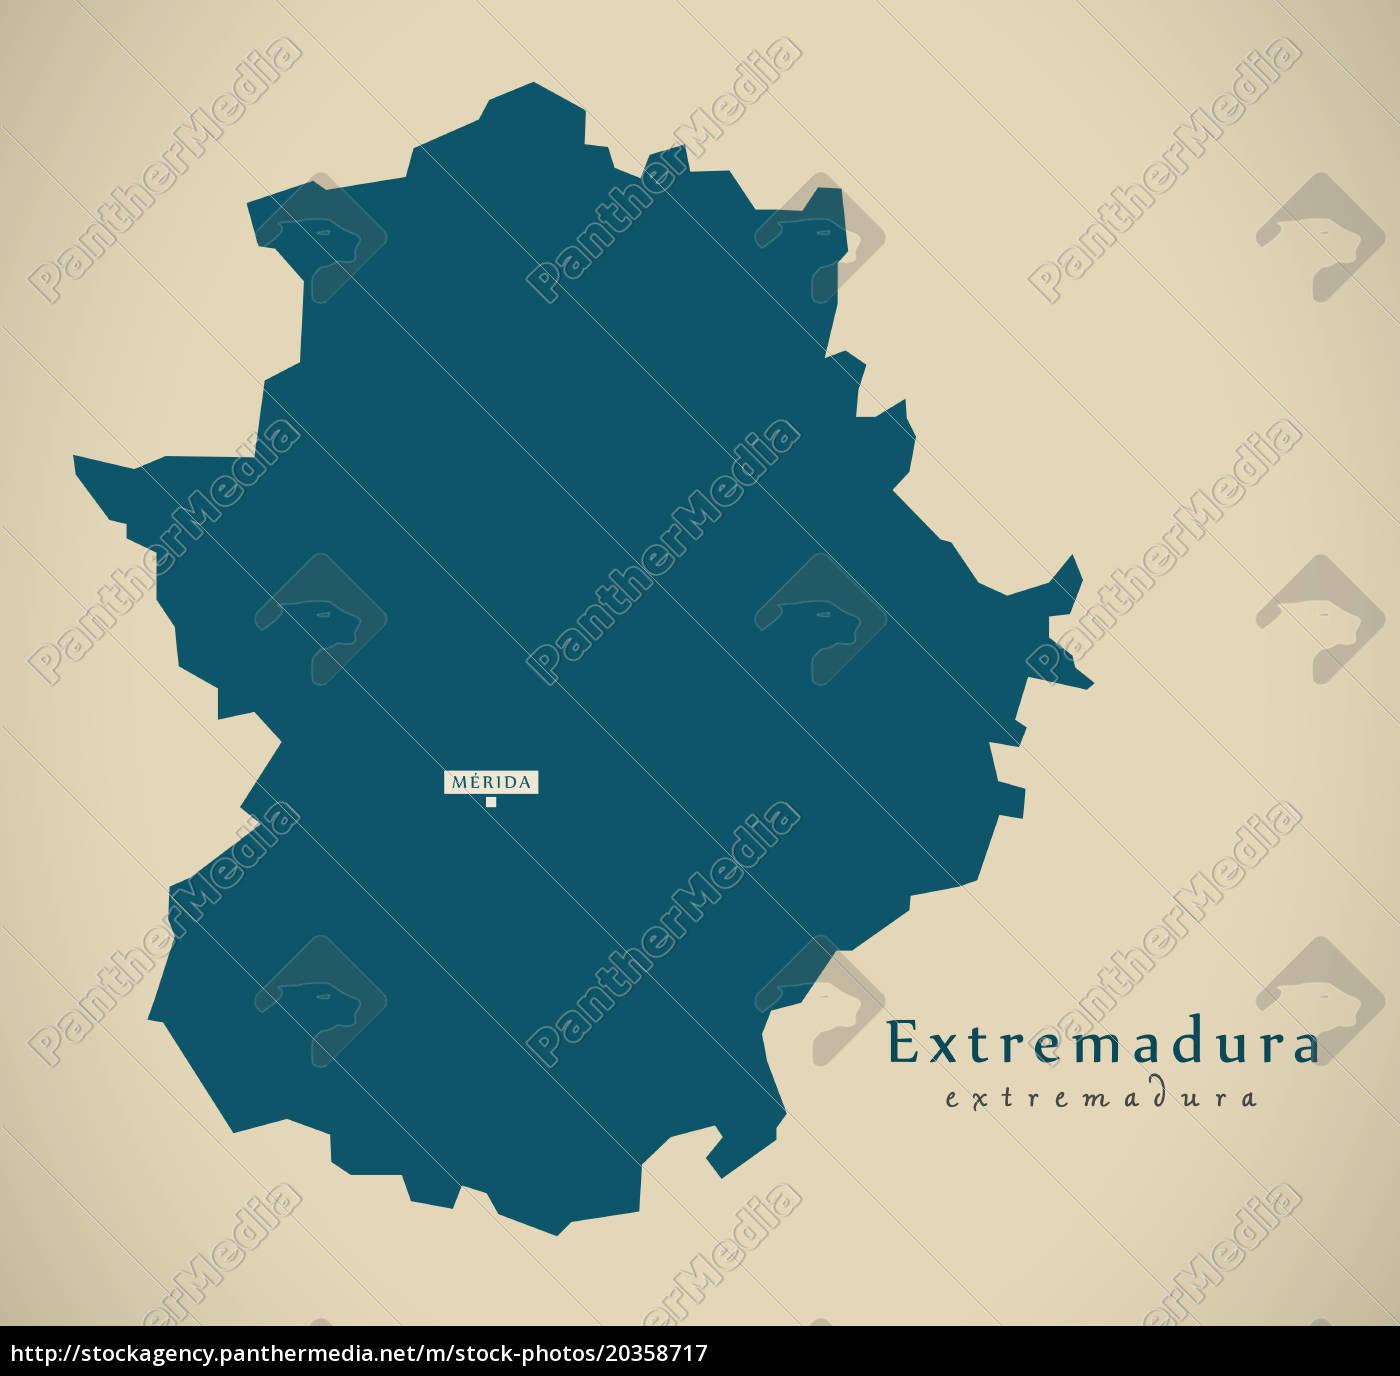 Moderne Karte Extremadura Spanien Es Illustration Stockfoto